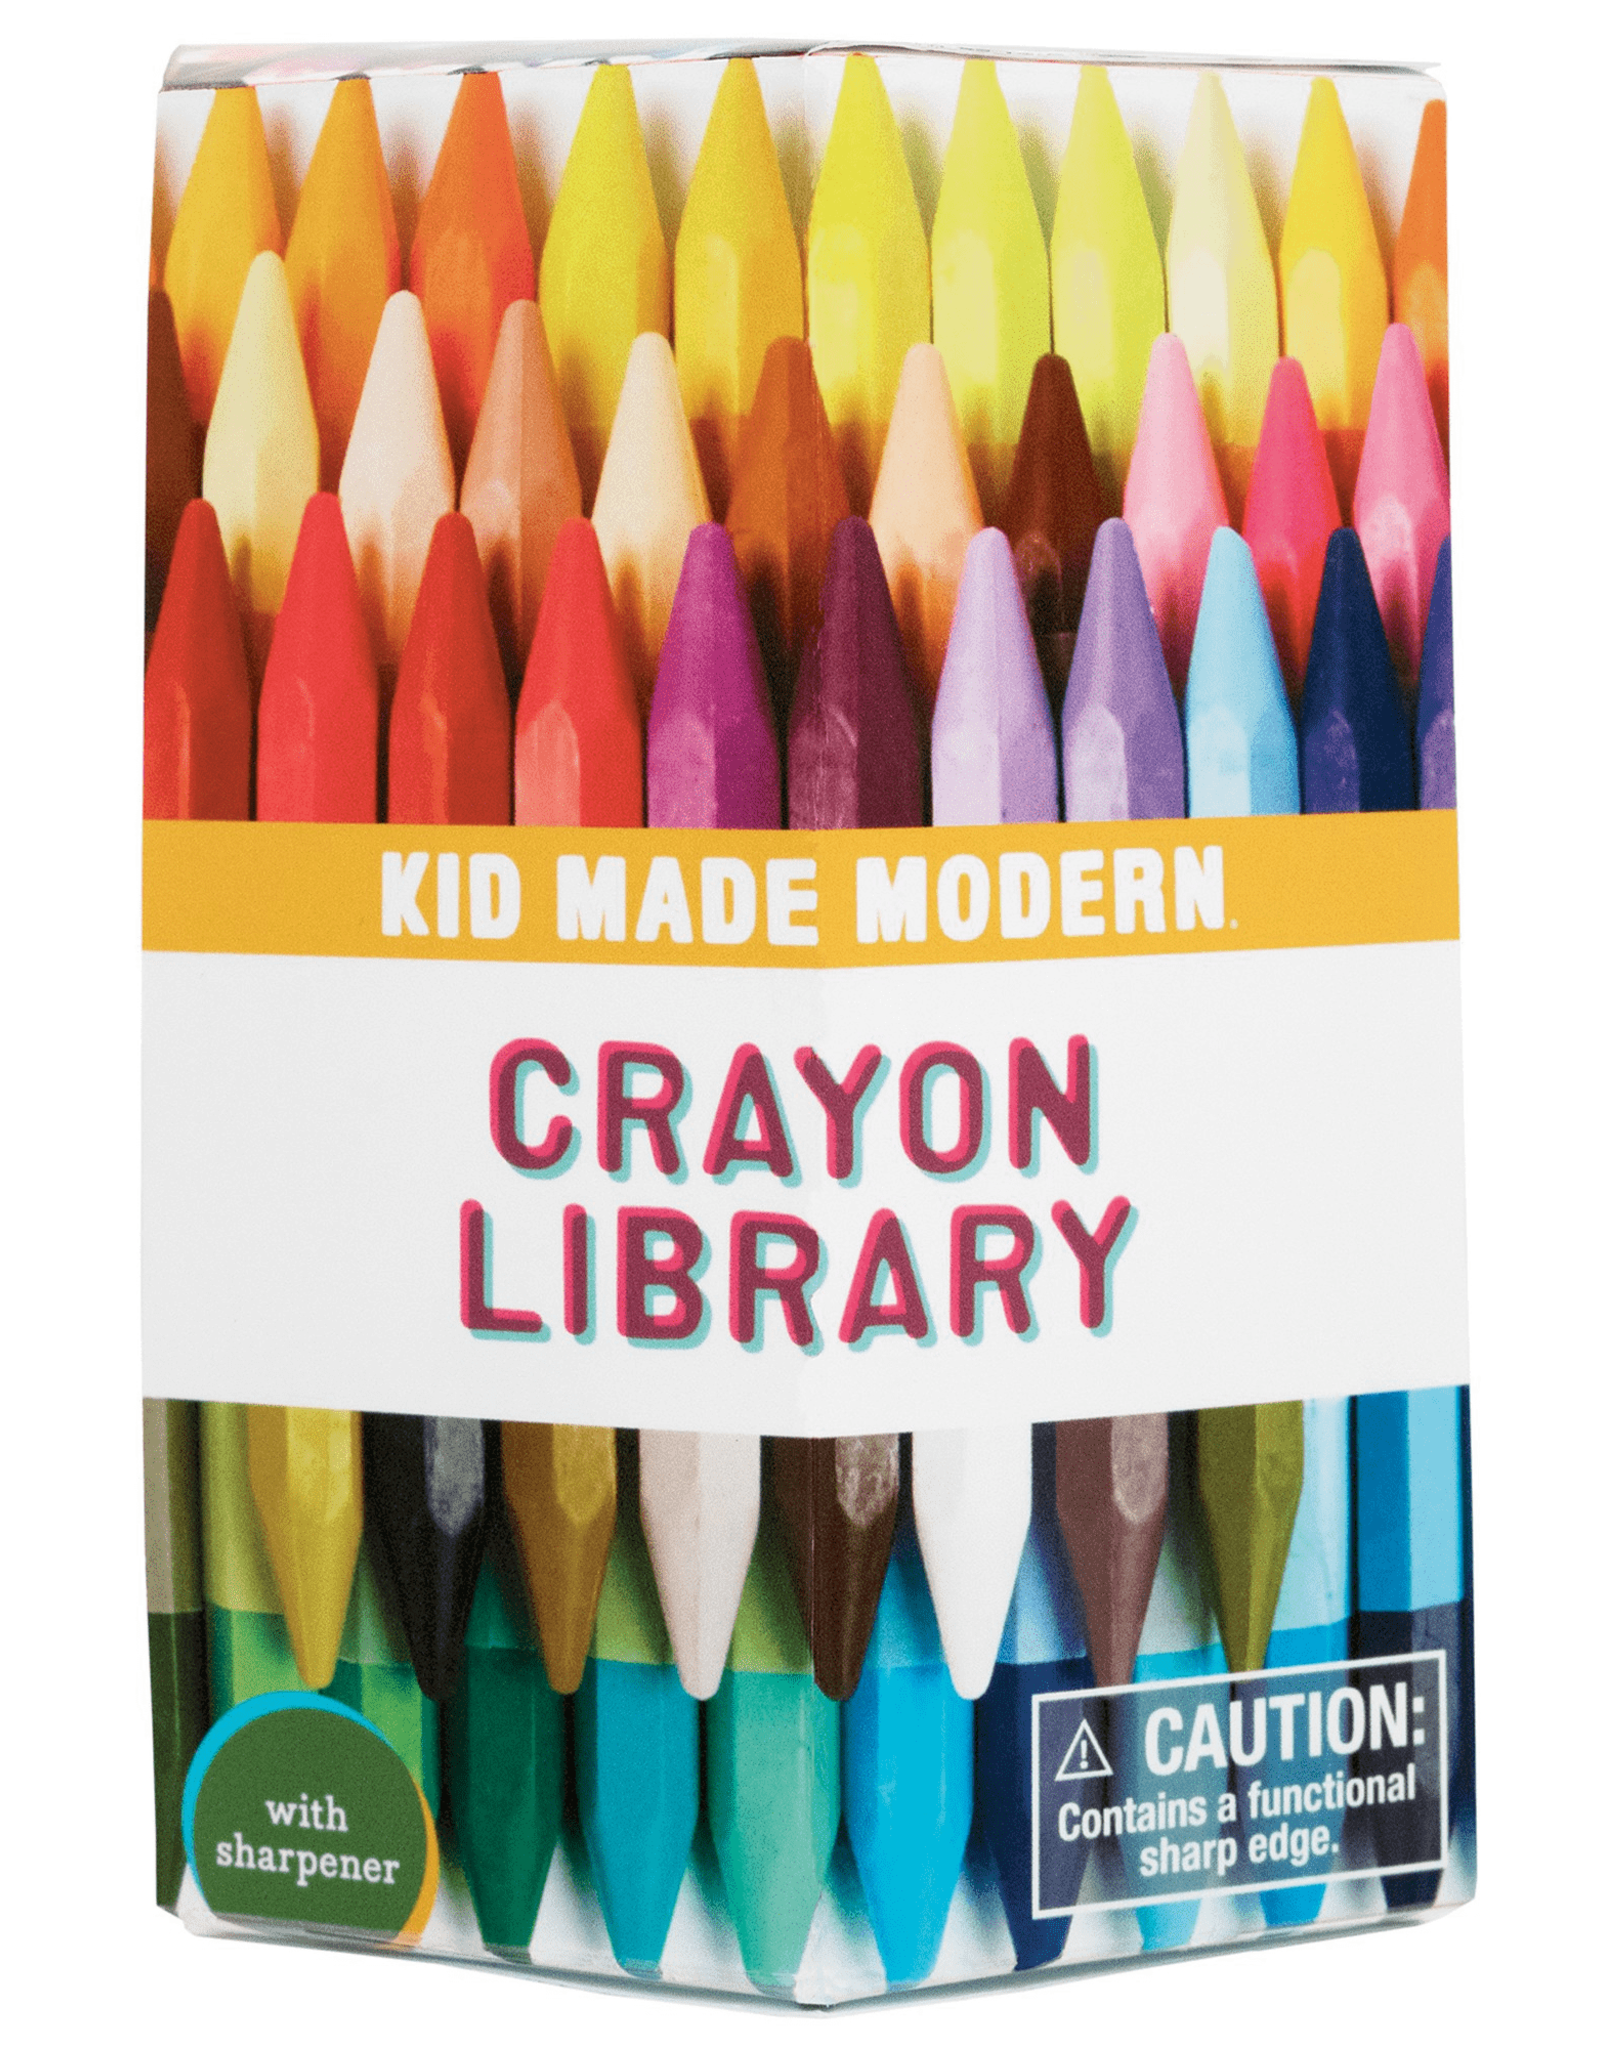 Kid Made Modern Crayon Library